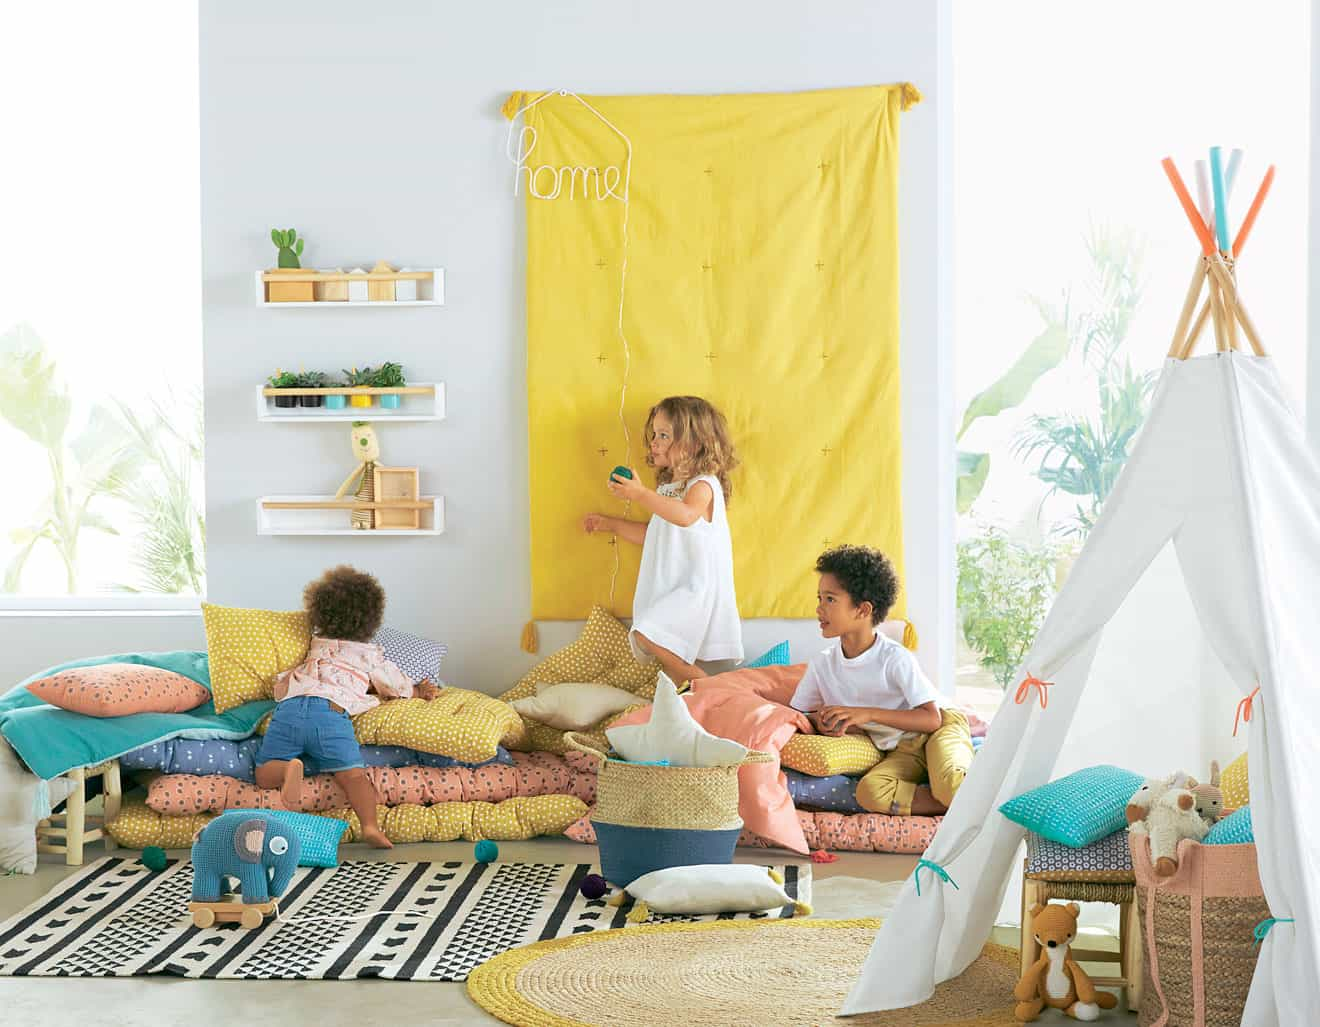 Emejing deco chambre enfant gallery for Deco chambre enfant